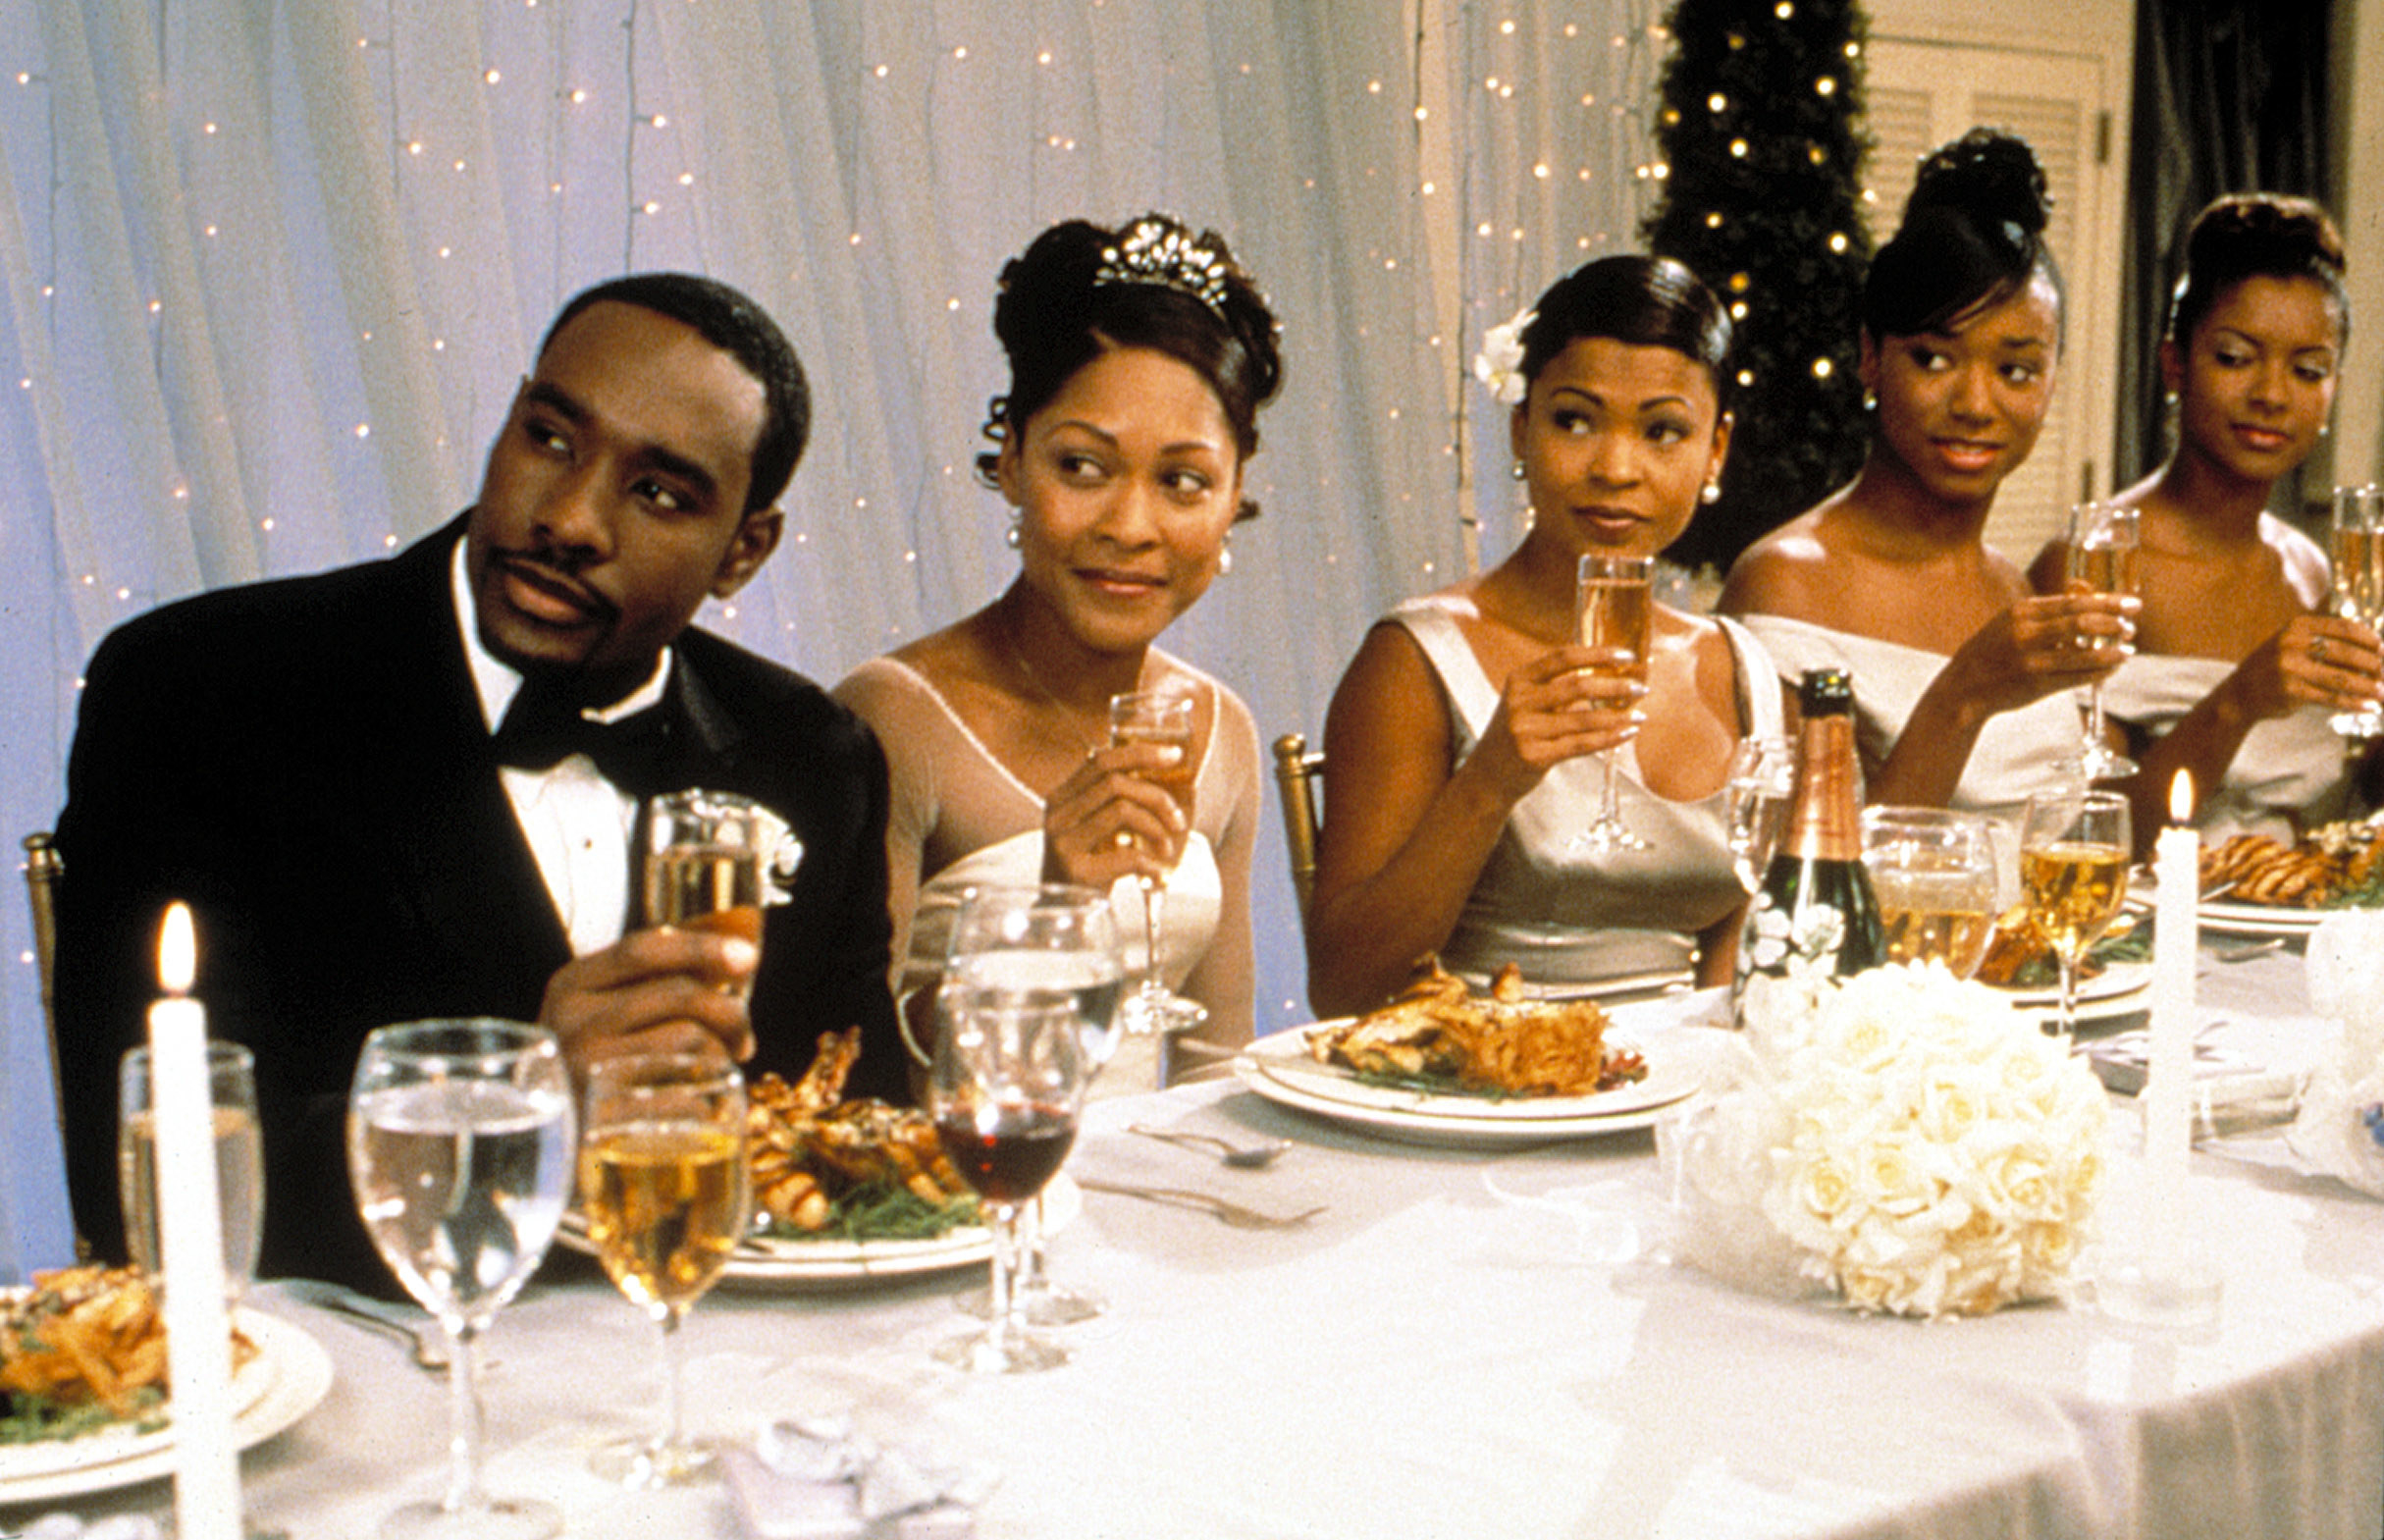 Wedding scene from The Best Man